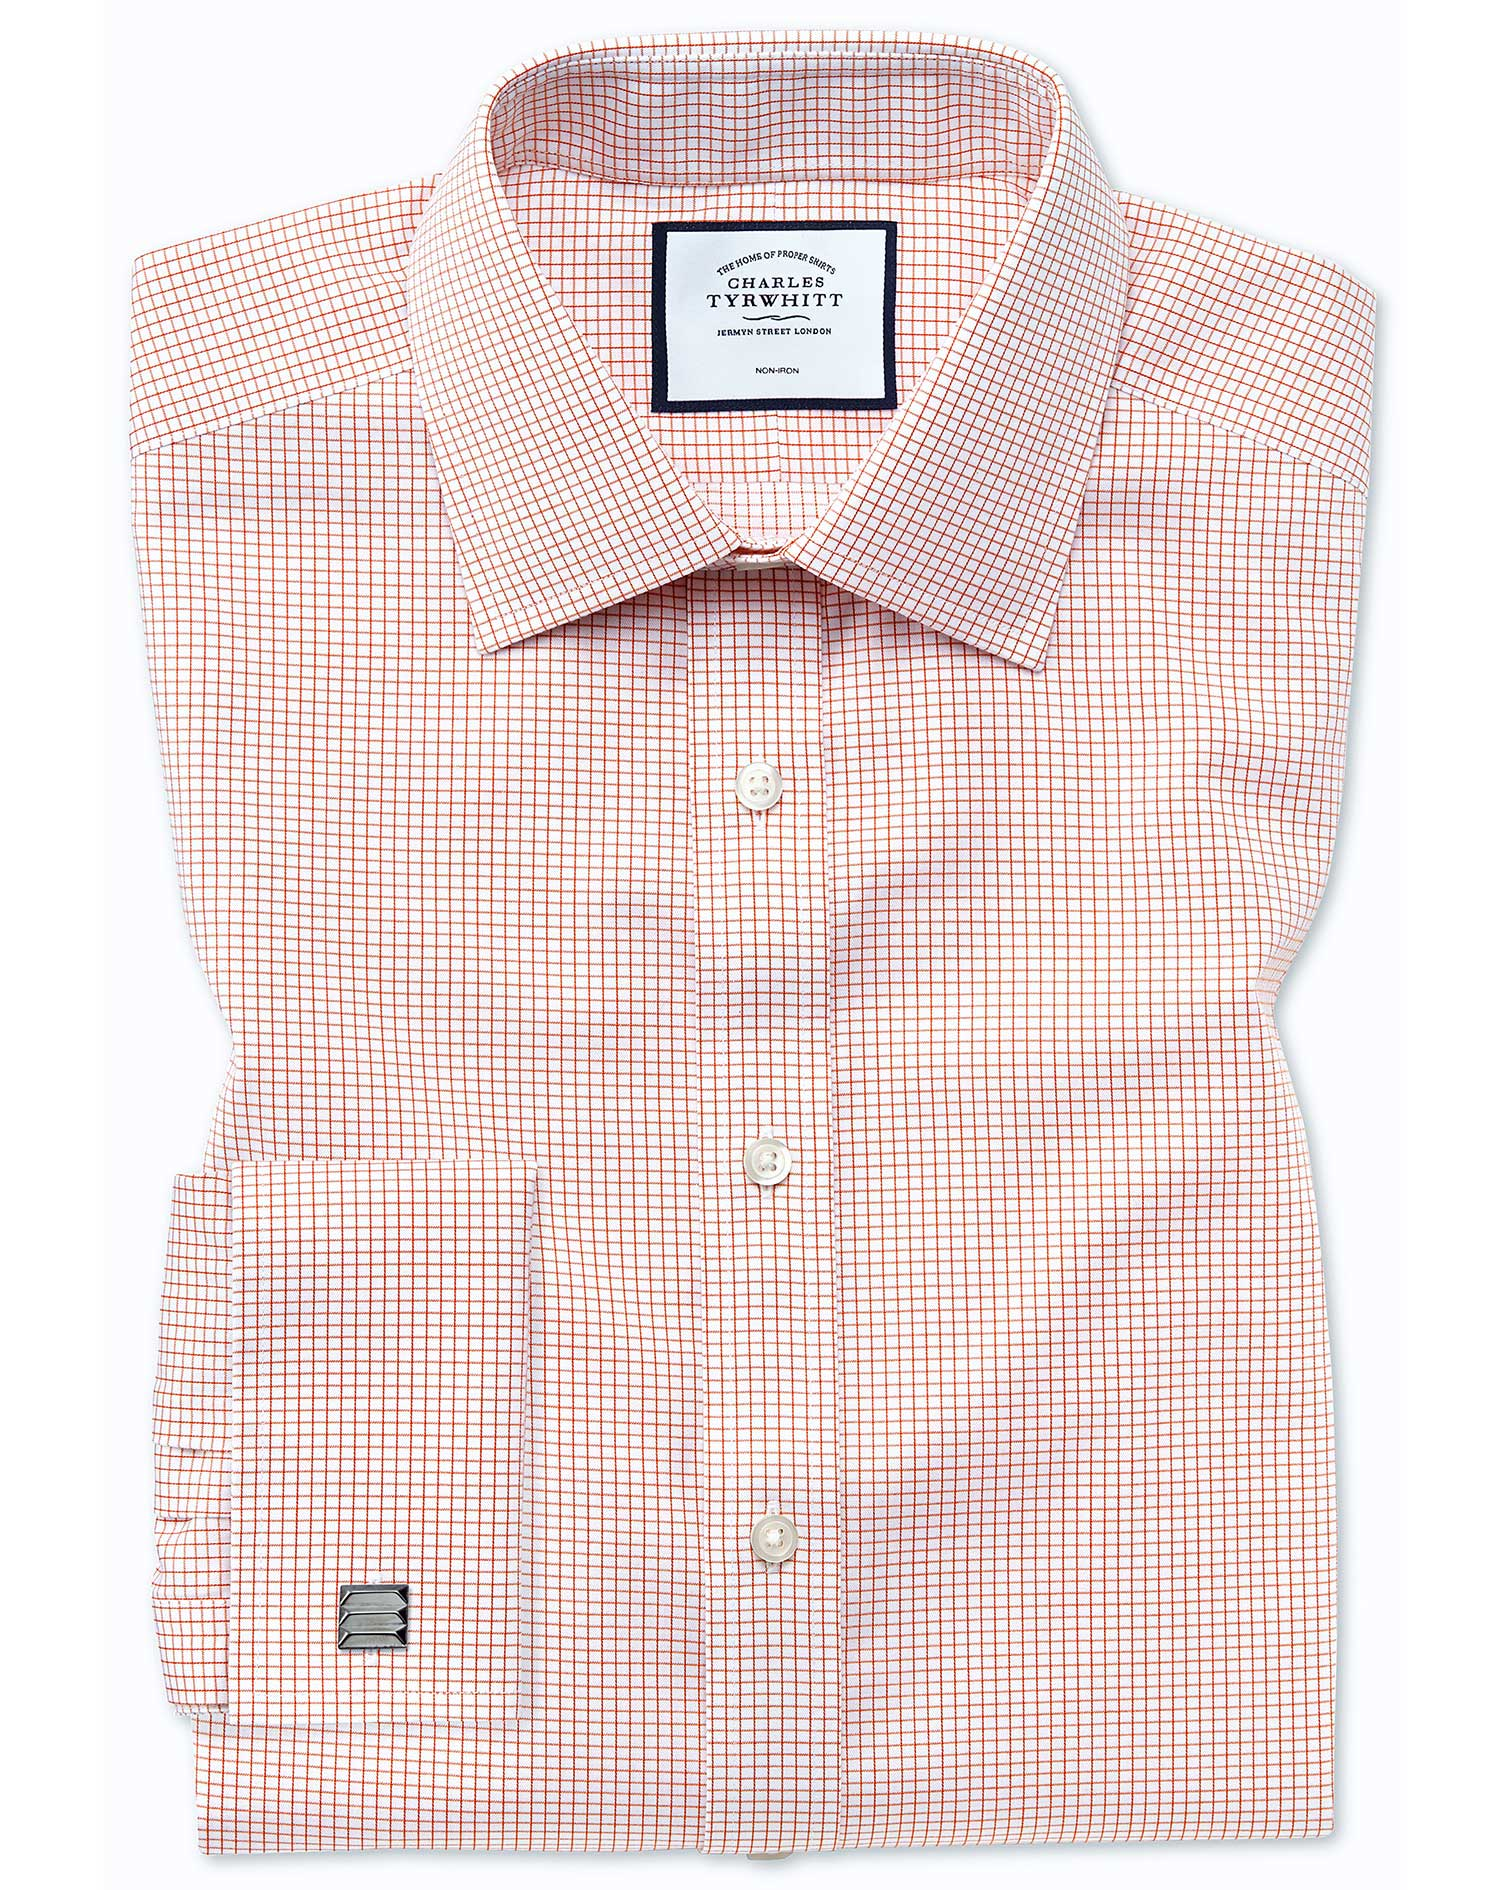 Classic Fit Non-Iron Twill Mini Grid Check Orange Cotton Formal Shirt Double Cuff Size 16/36 by Char